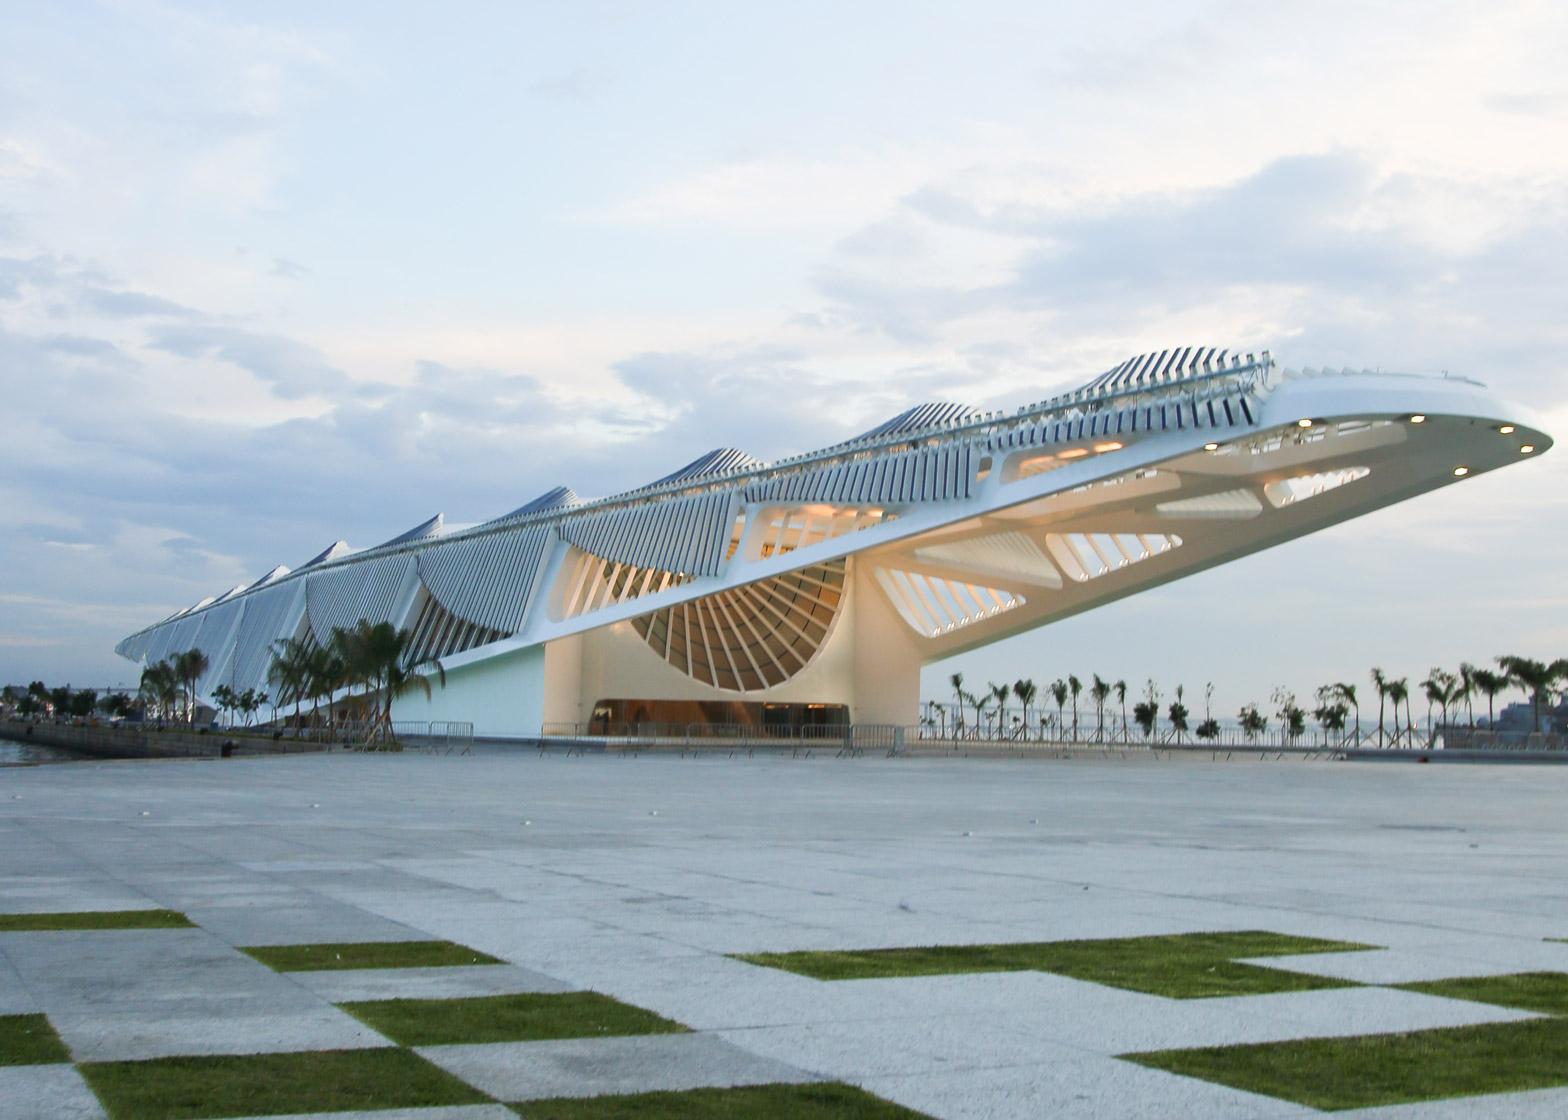 Museum of Tomorrow by Santiago Calatrava